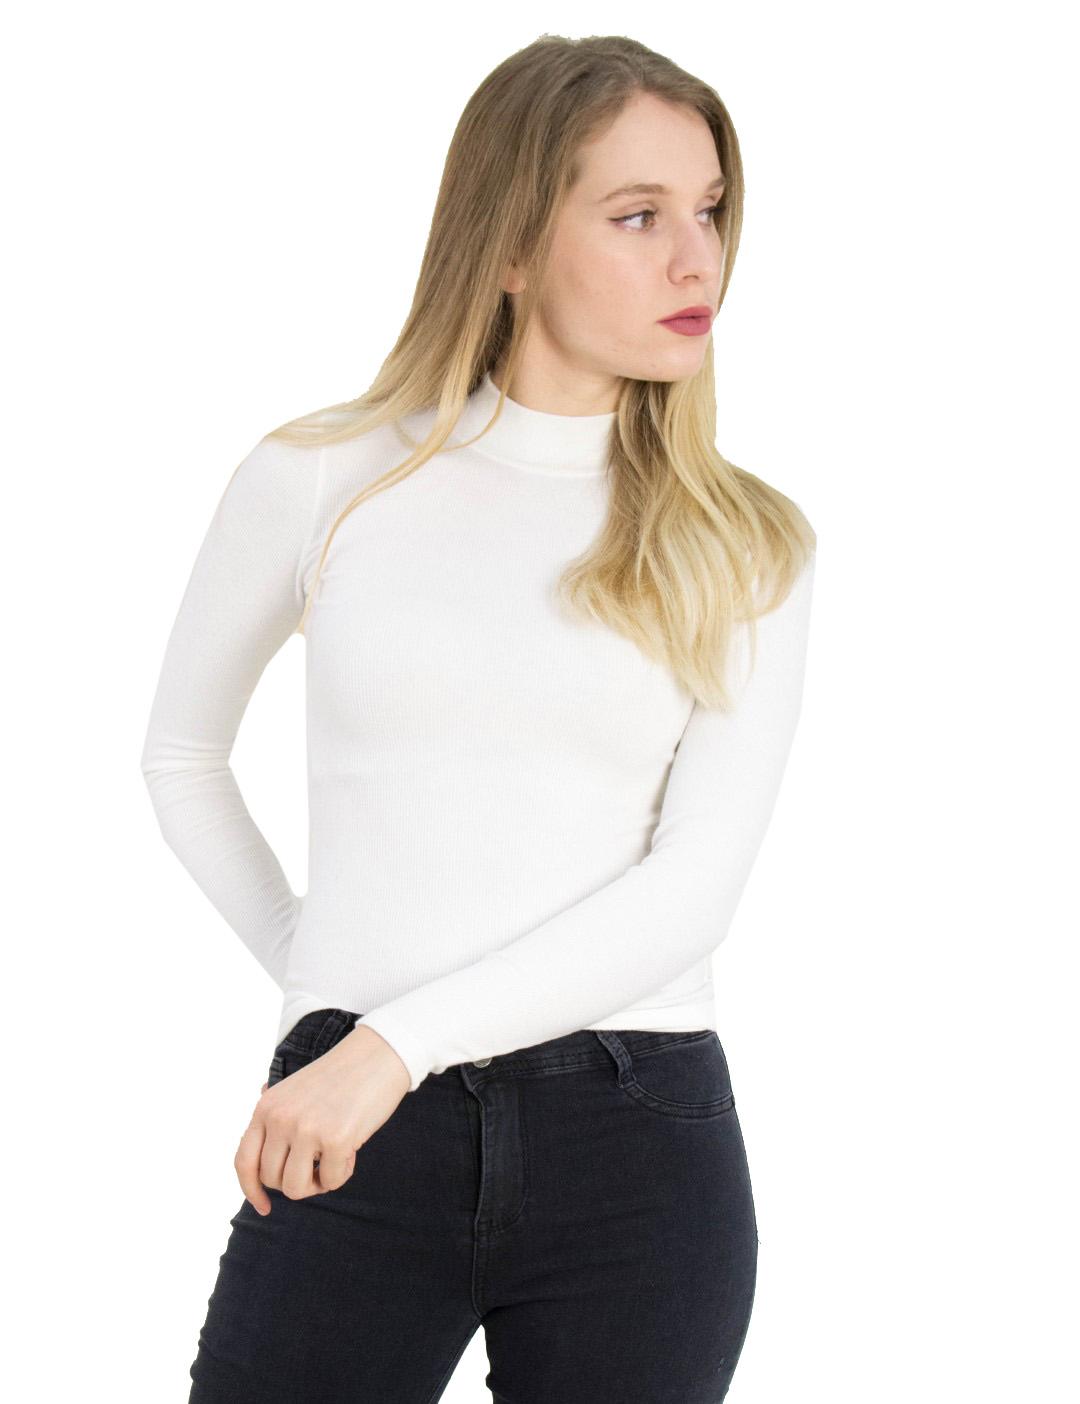 6549f9026a7d Γυναικεία λευκή ριπ μπλούζα λουπέτο Cocktail 014101079 - Glami.gr